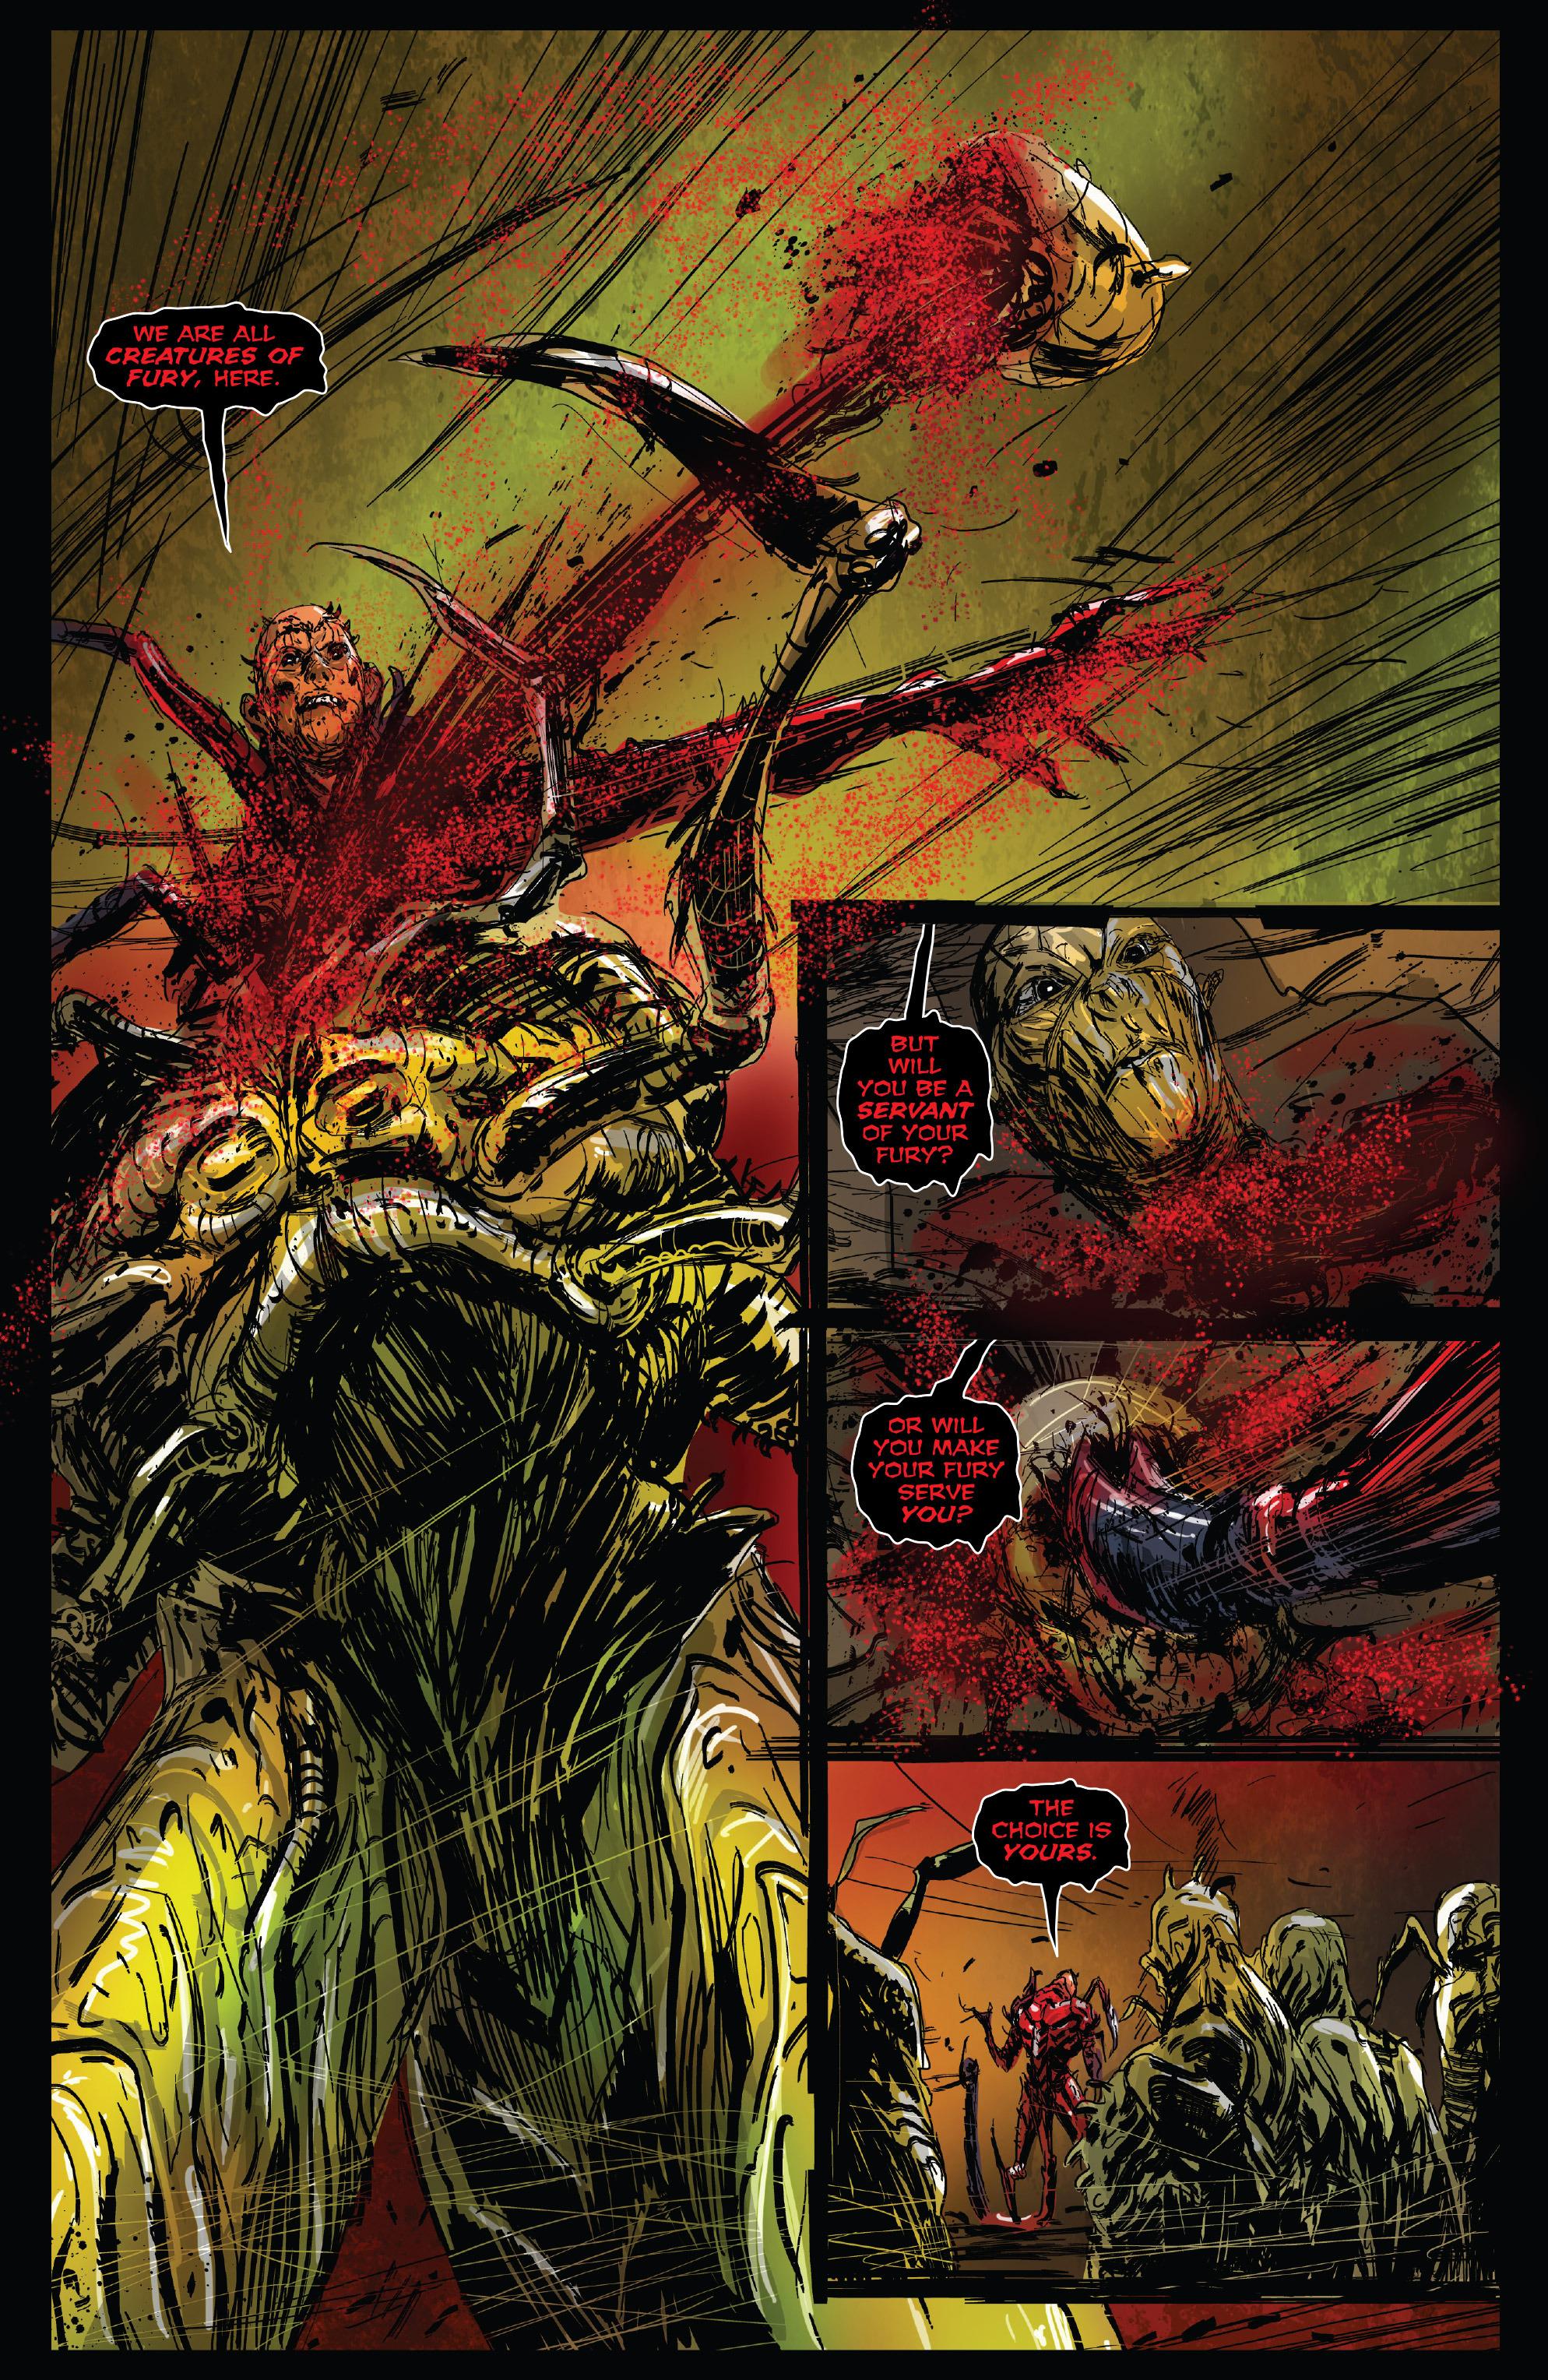 Read online Clive Barker's Hellraiser: The Dark Watch comic -  Issue # TPB 3 - 13